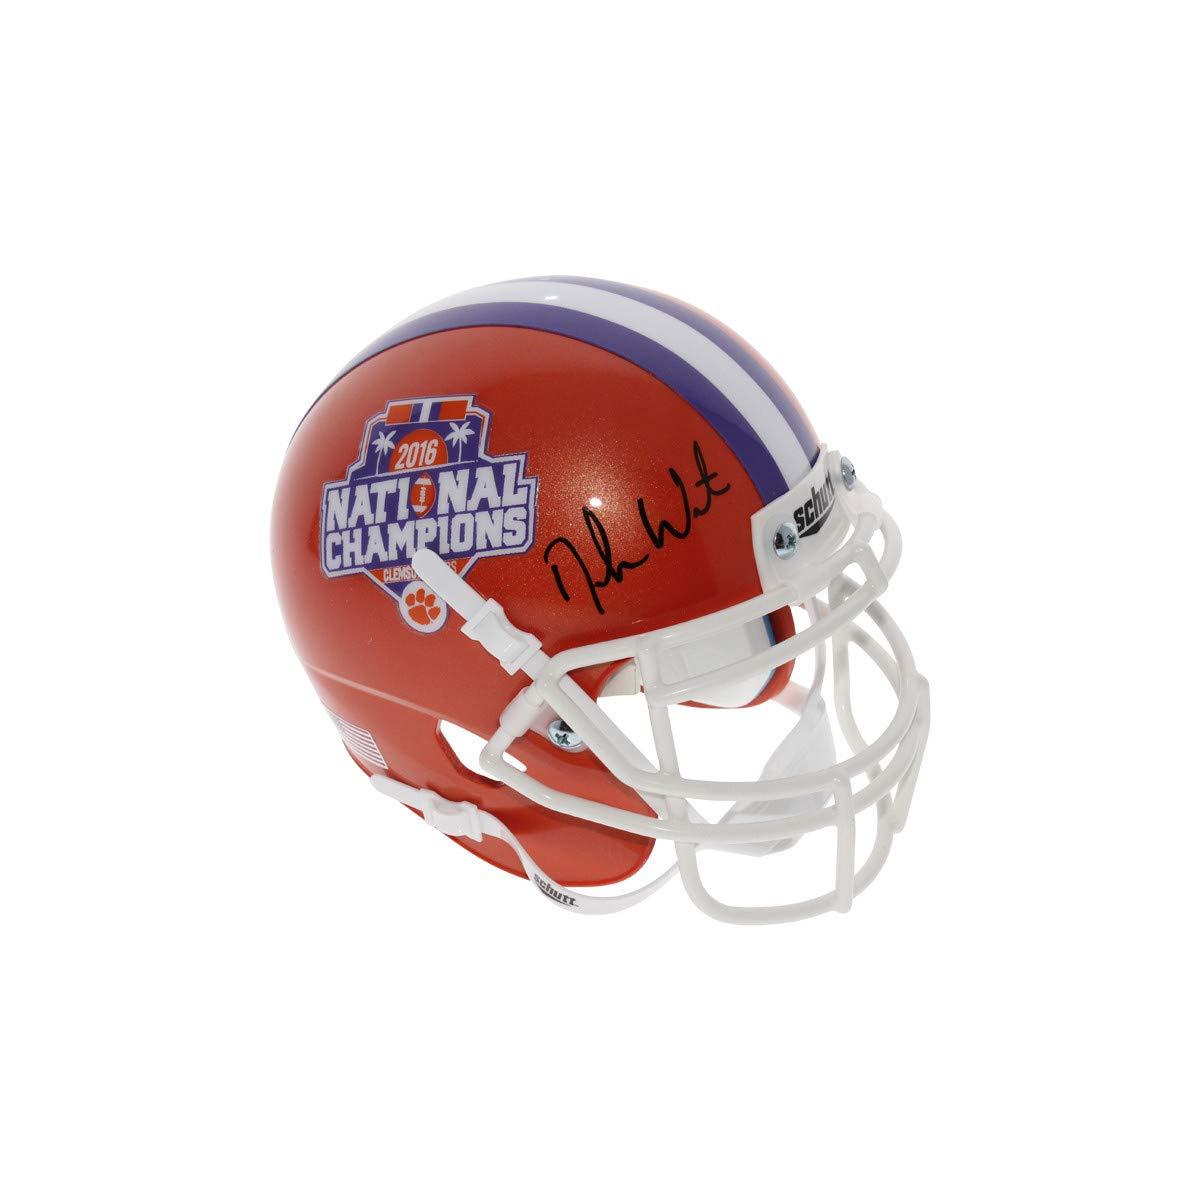 Deshaun Watson Autographed Signed Clemson Tigers Schutt 2016 National Champions Commemorative Mini Helmet - Beckett Authentic